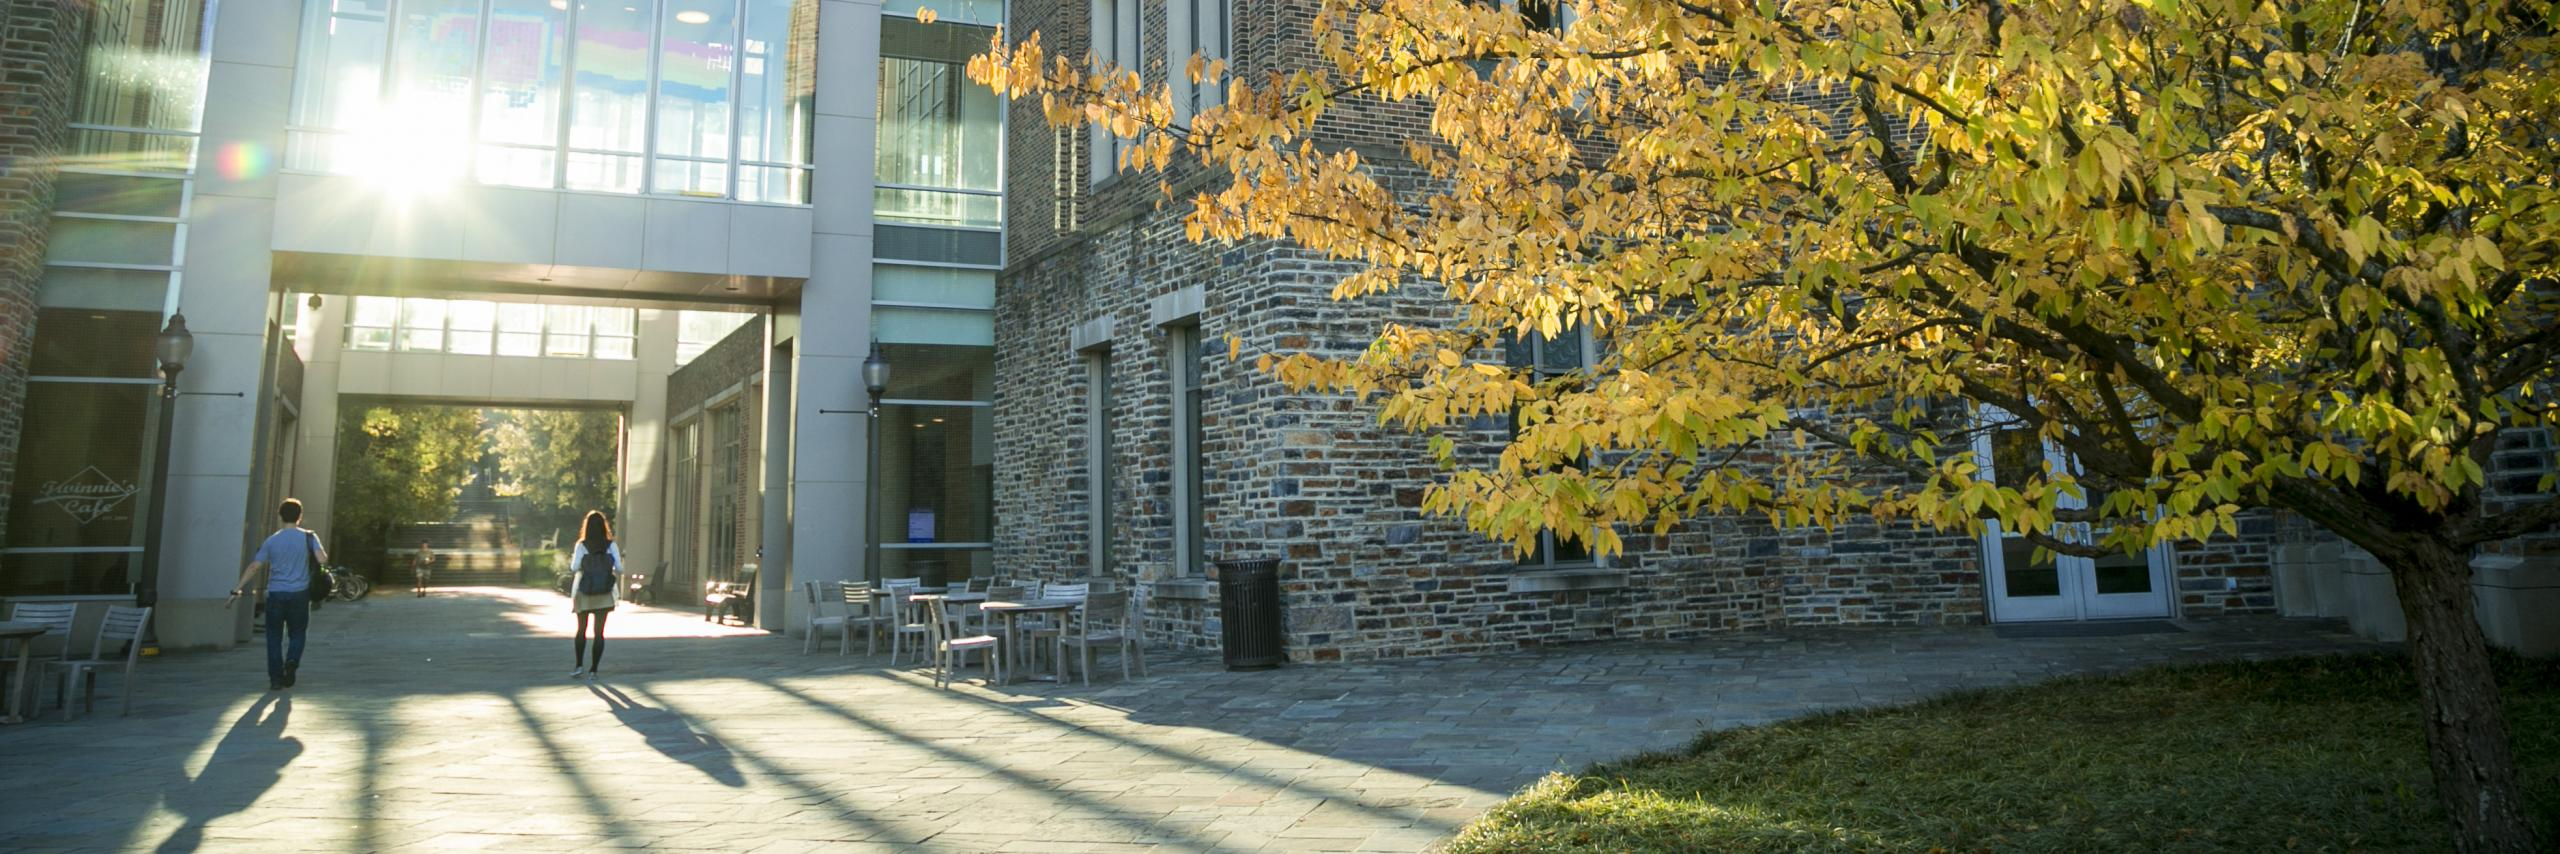 The Fitzpatrick Center at Duke University in autumn.